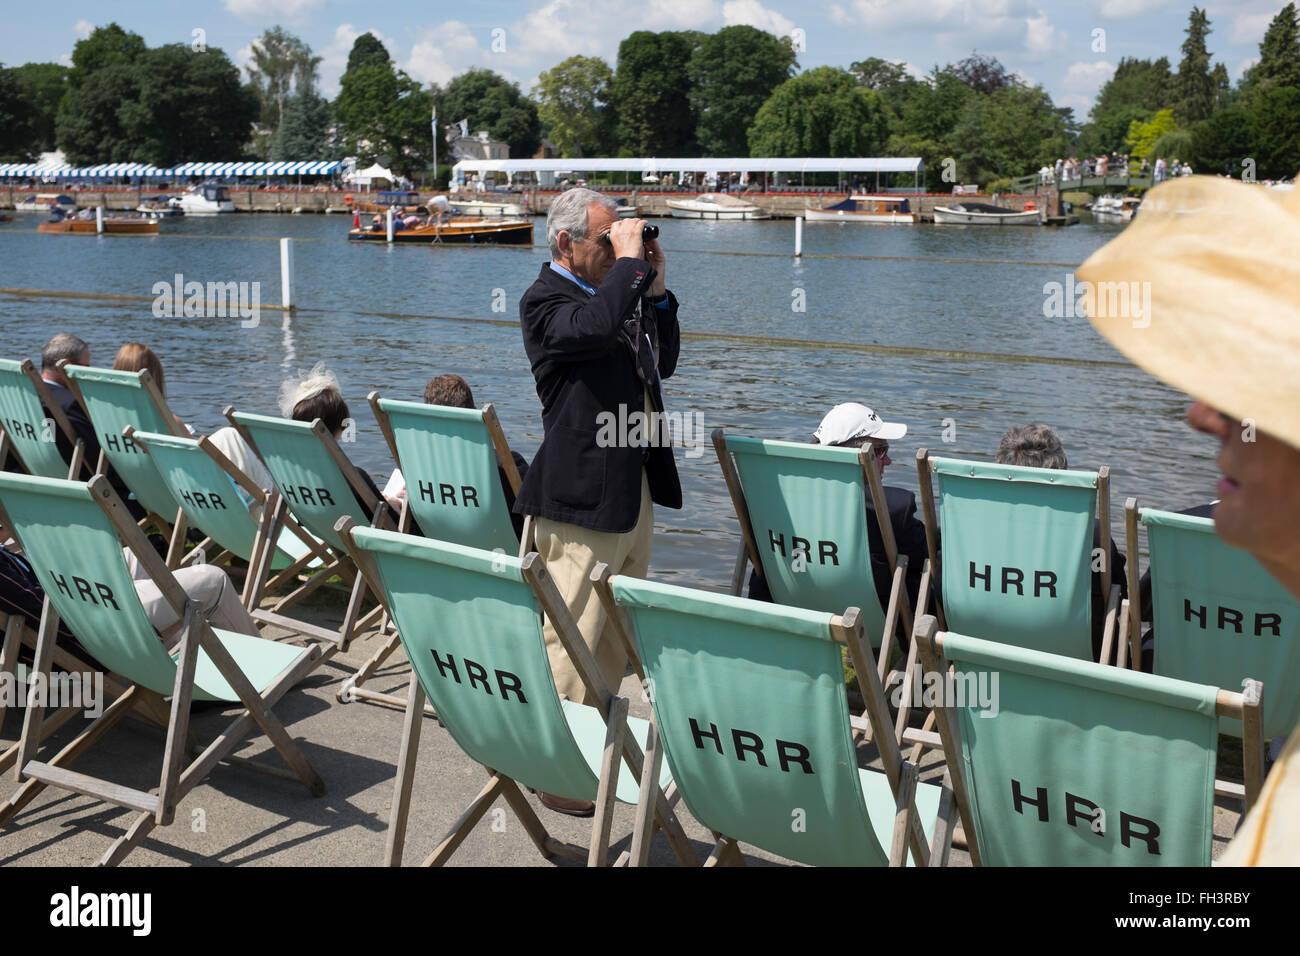 A spectator at Henley Royal Regatta surveys the course. - Stock Image